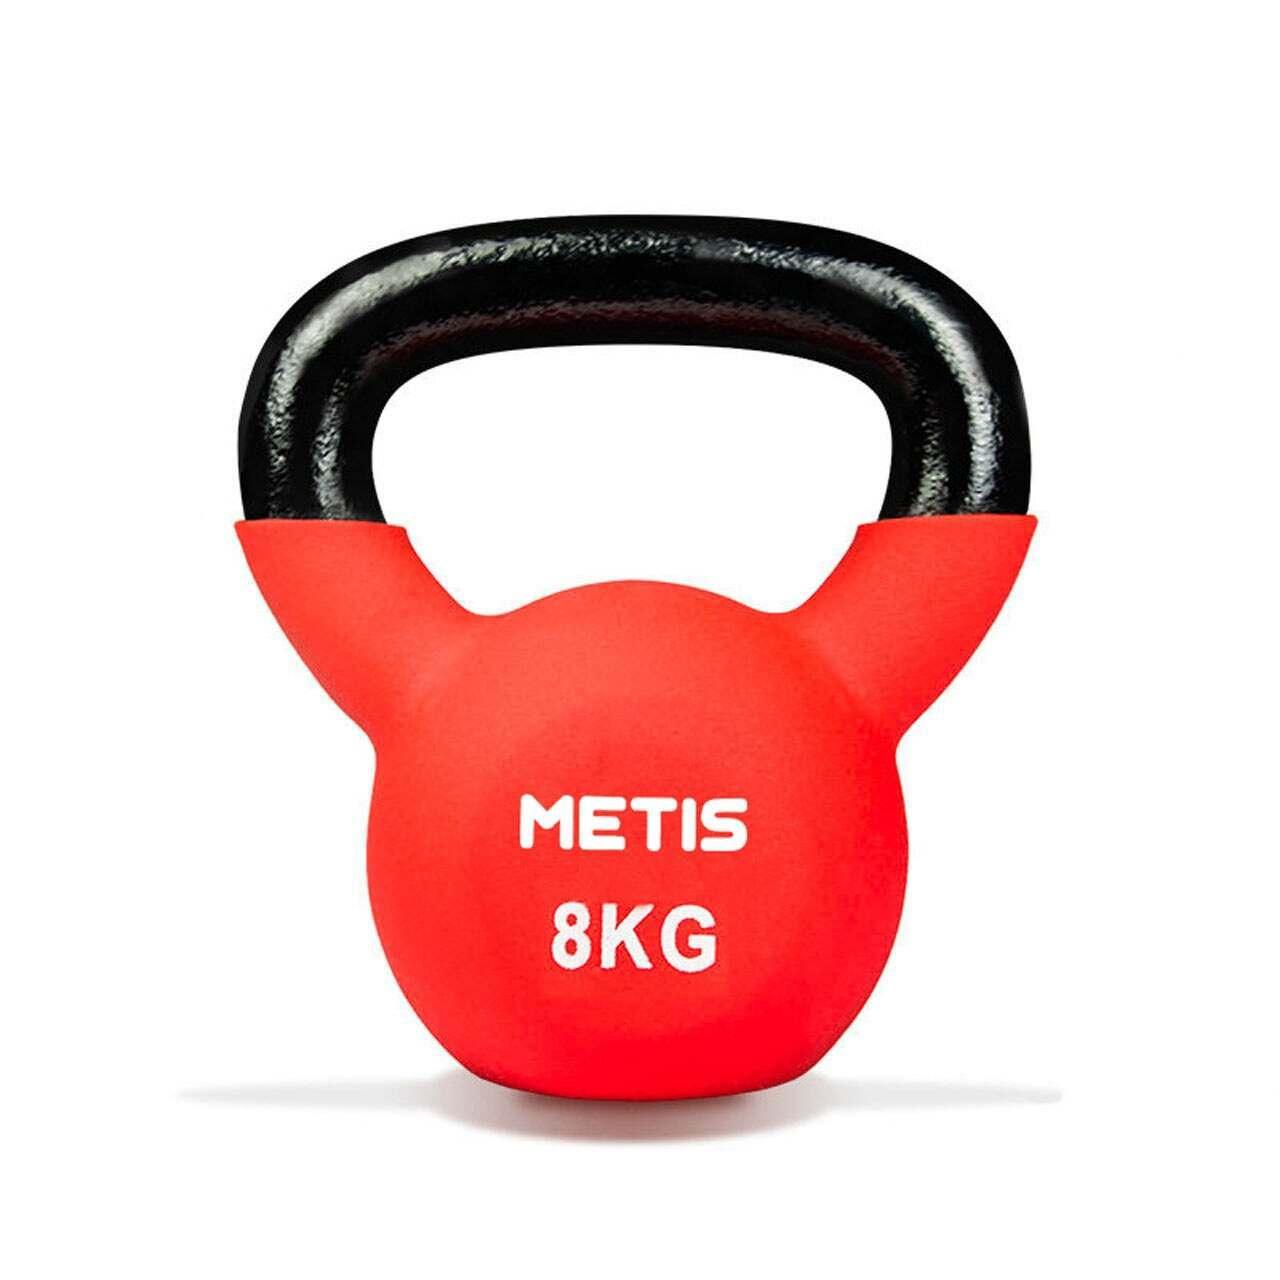 Pesas Rusas Kettlebells de neopreno de Metis [4kg-20kg]